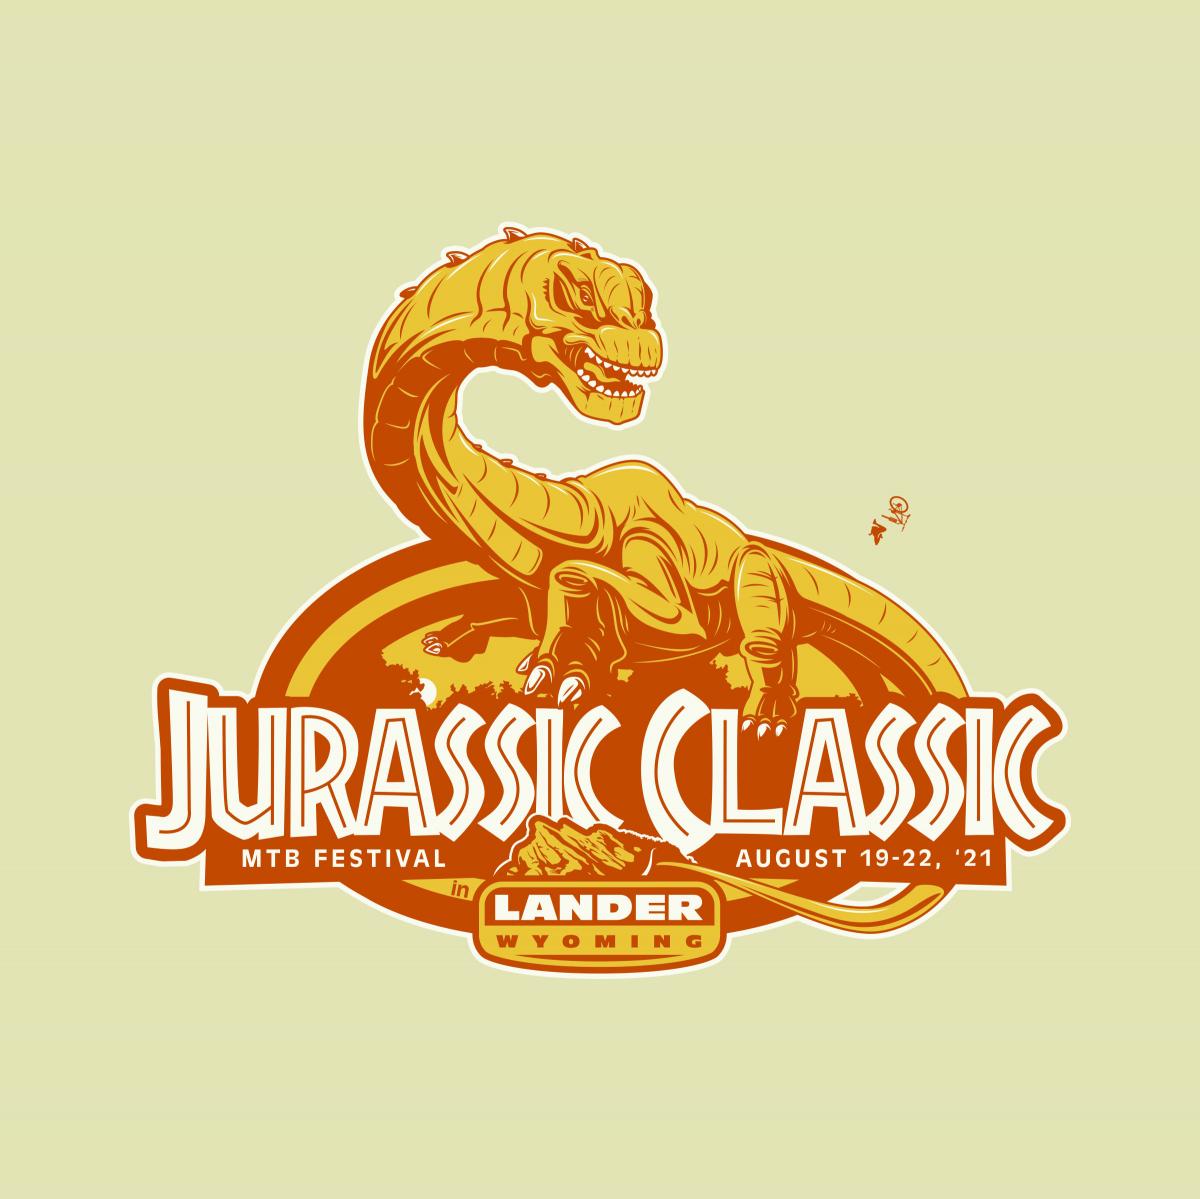 Jurassic Classic Mountain Bike Festival